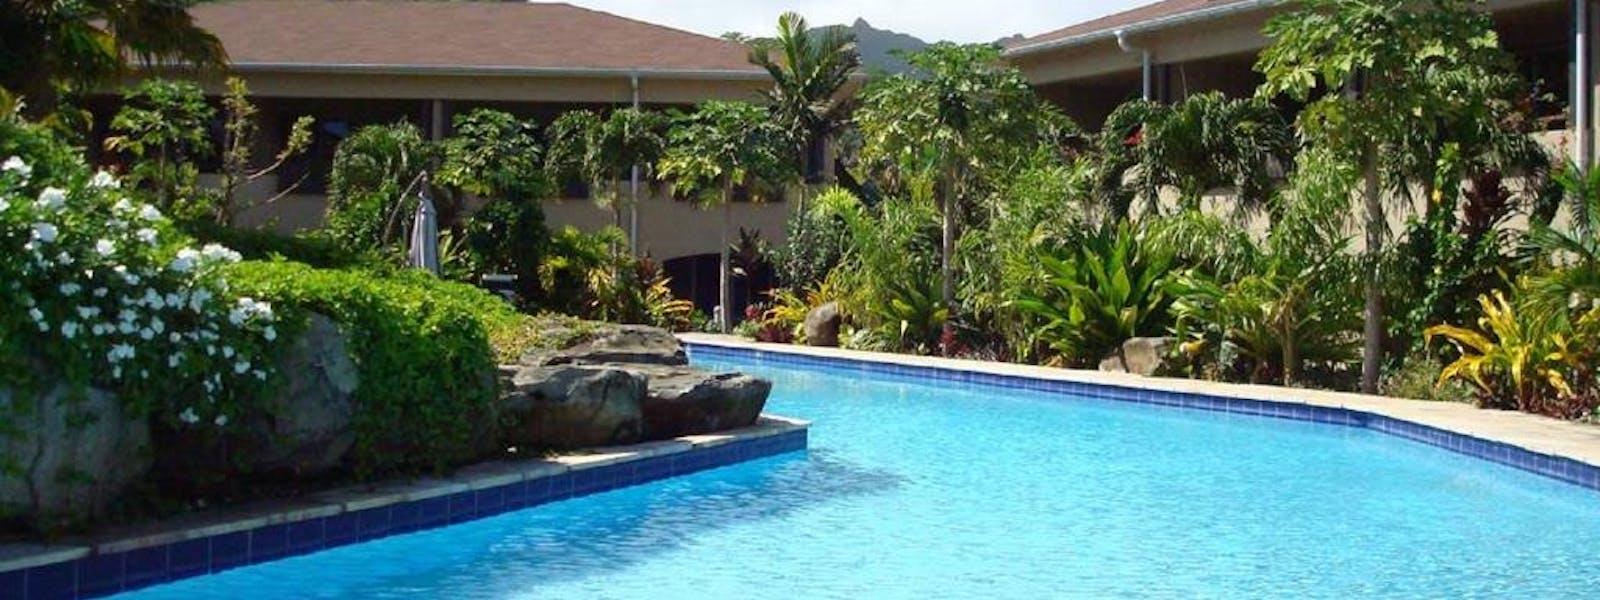 Home Sunset Resort Rarotonga Cook Islands